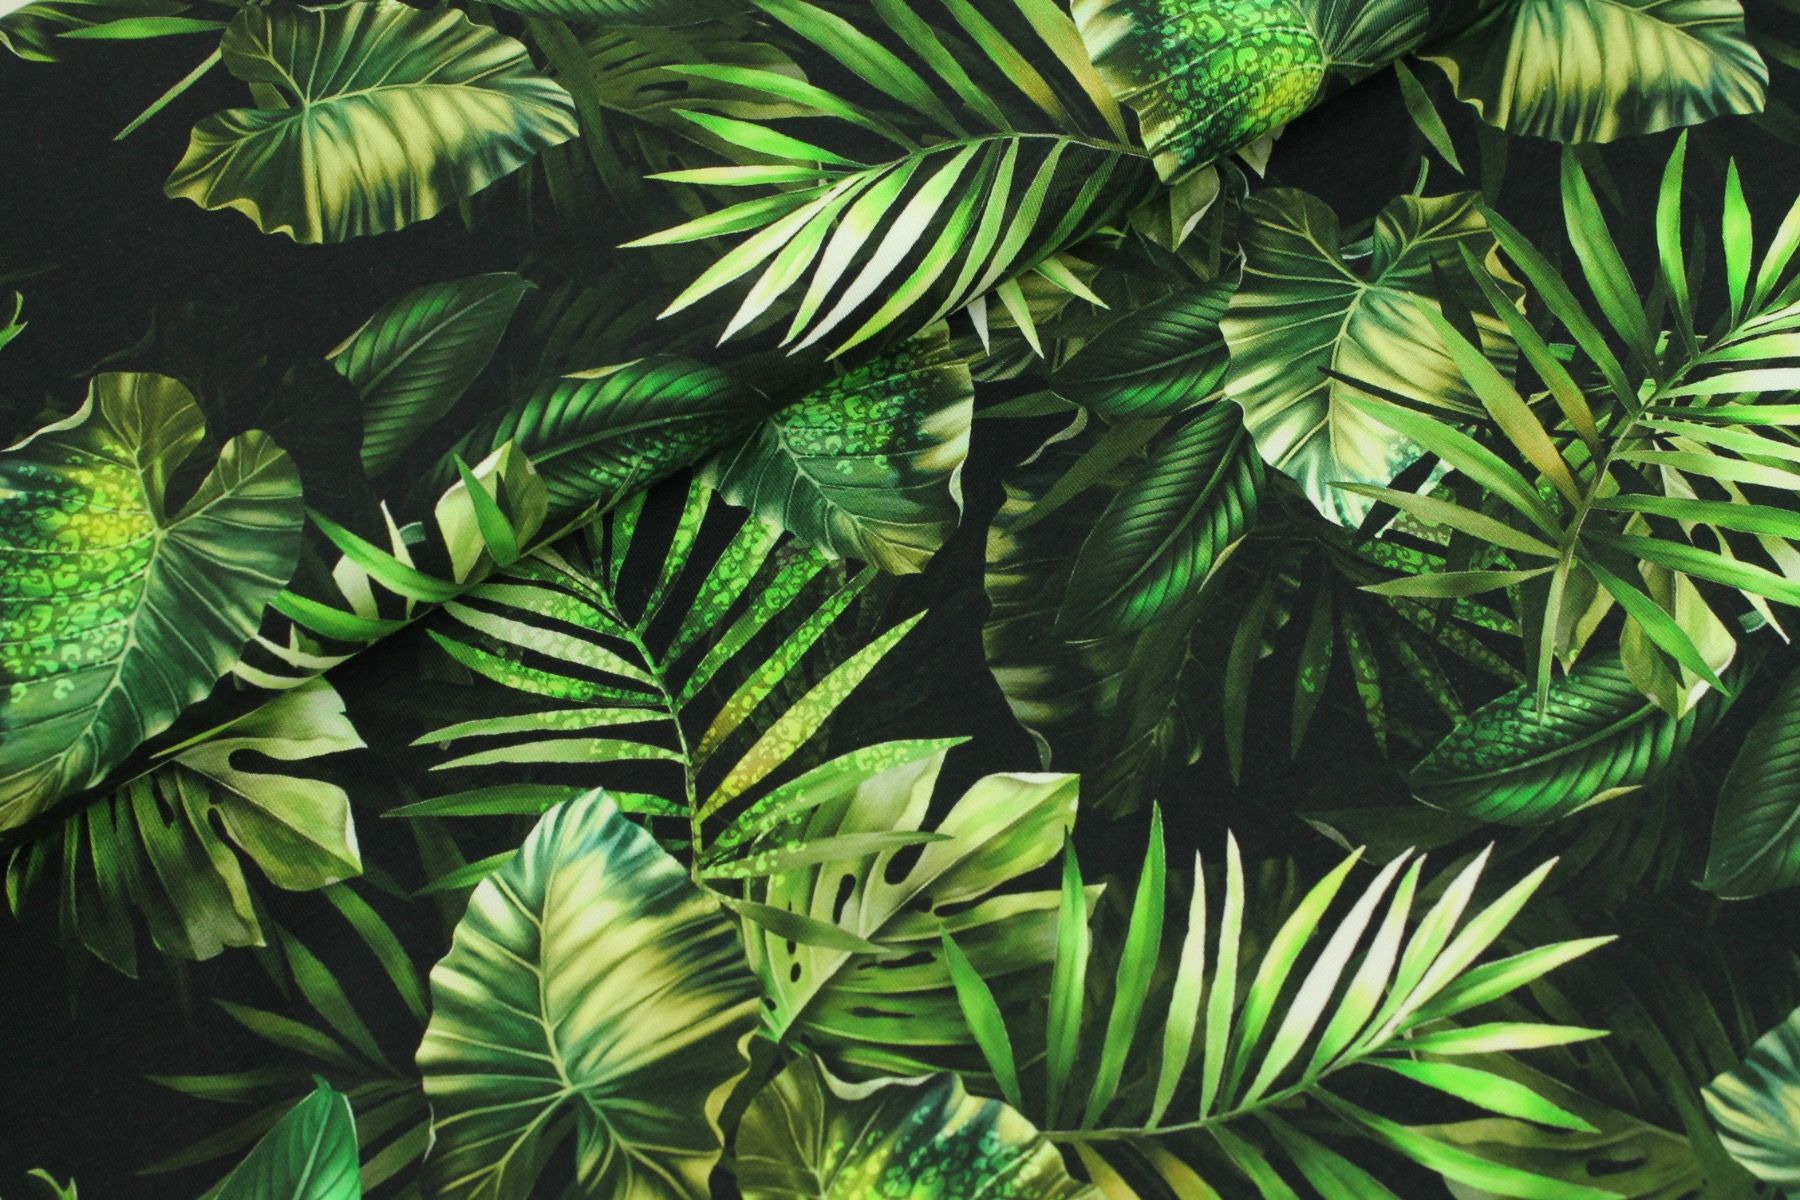 Natural Leaves Tricot Groen - Megan Blue